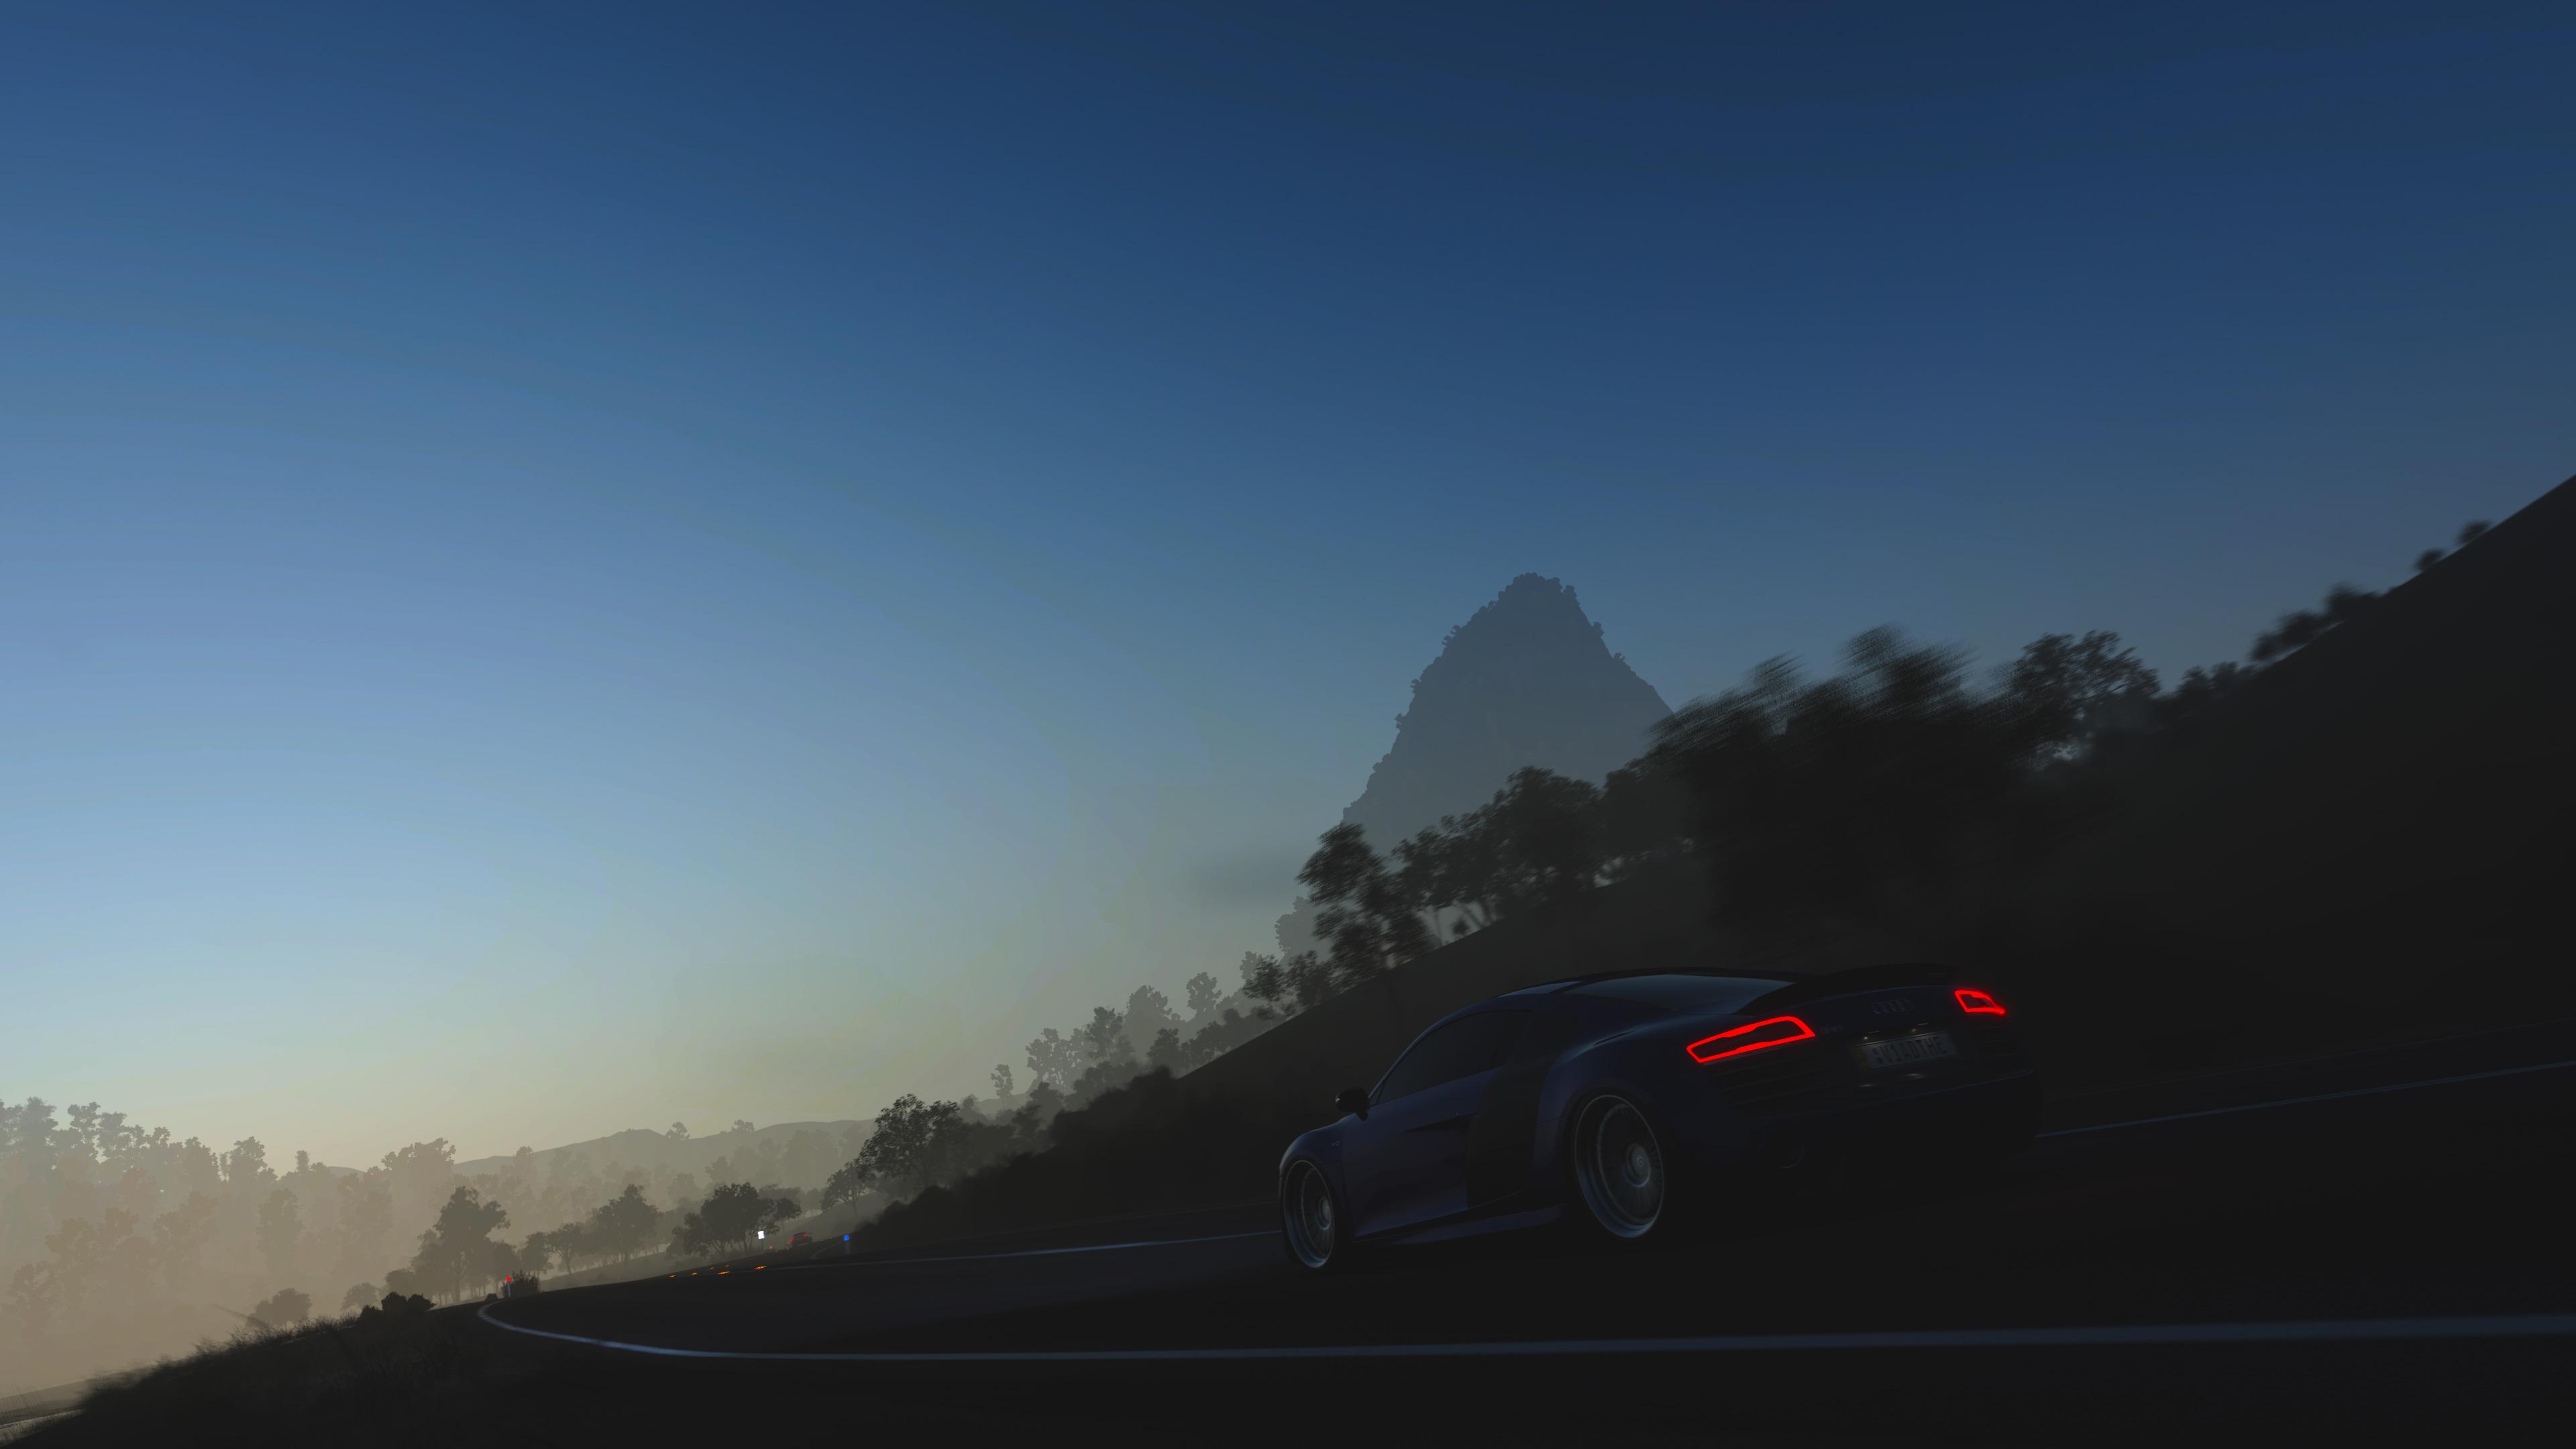 Forza horizon 3 audi r8 4k hd games 4k wallpapers - Is forza horizon 3 4k ...